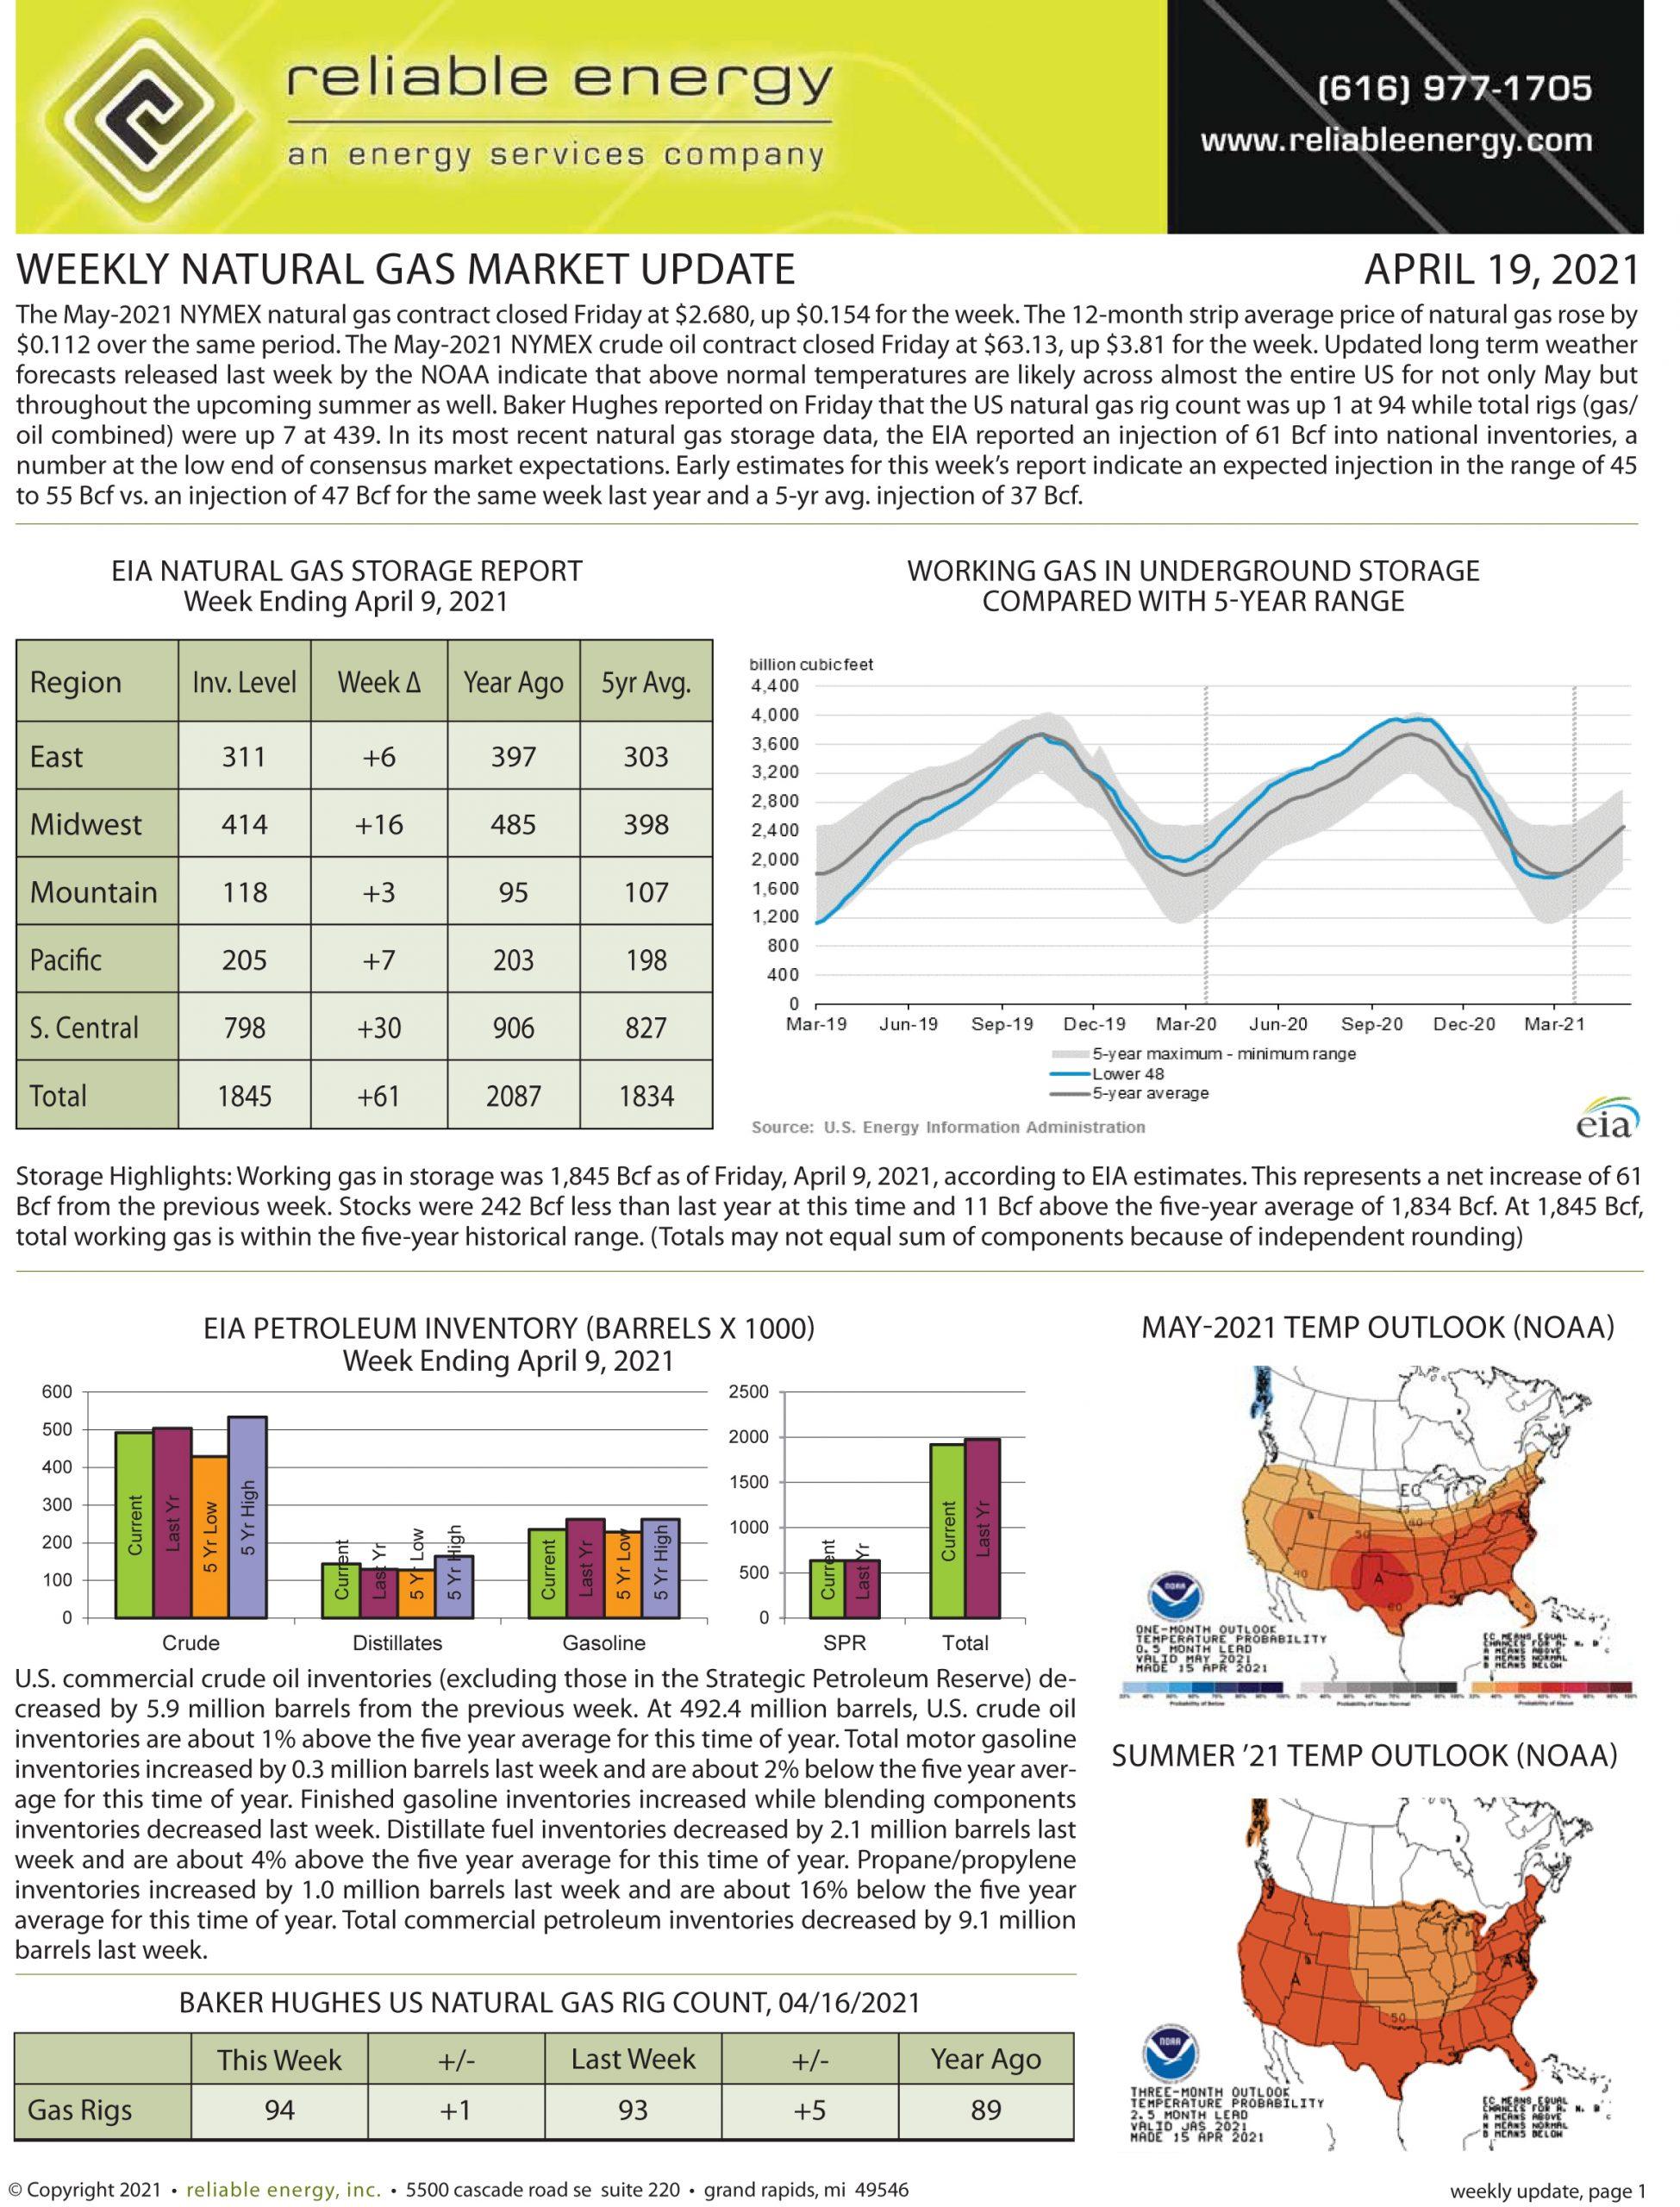 Natural Gas Market Update – April 19, 2021